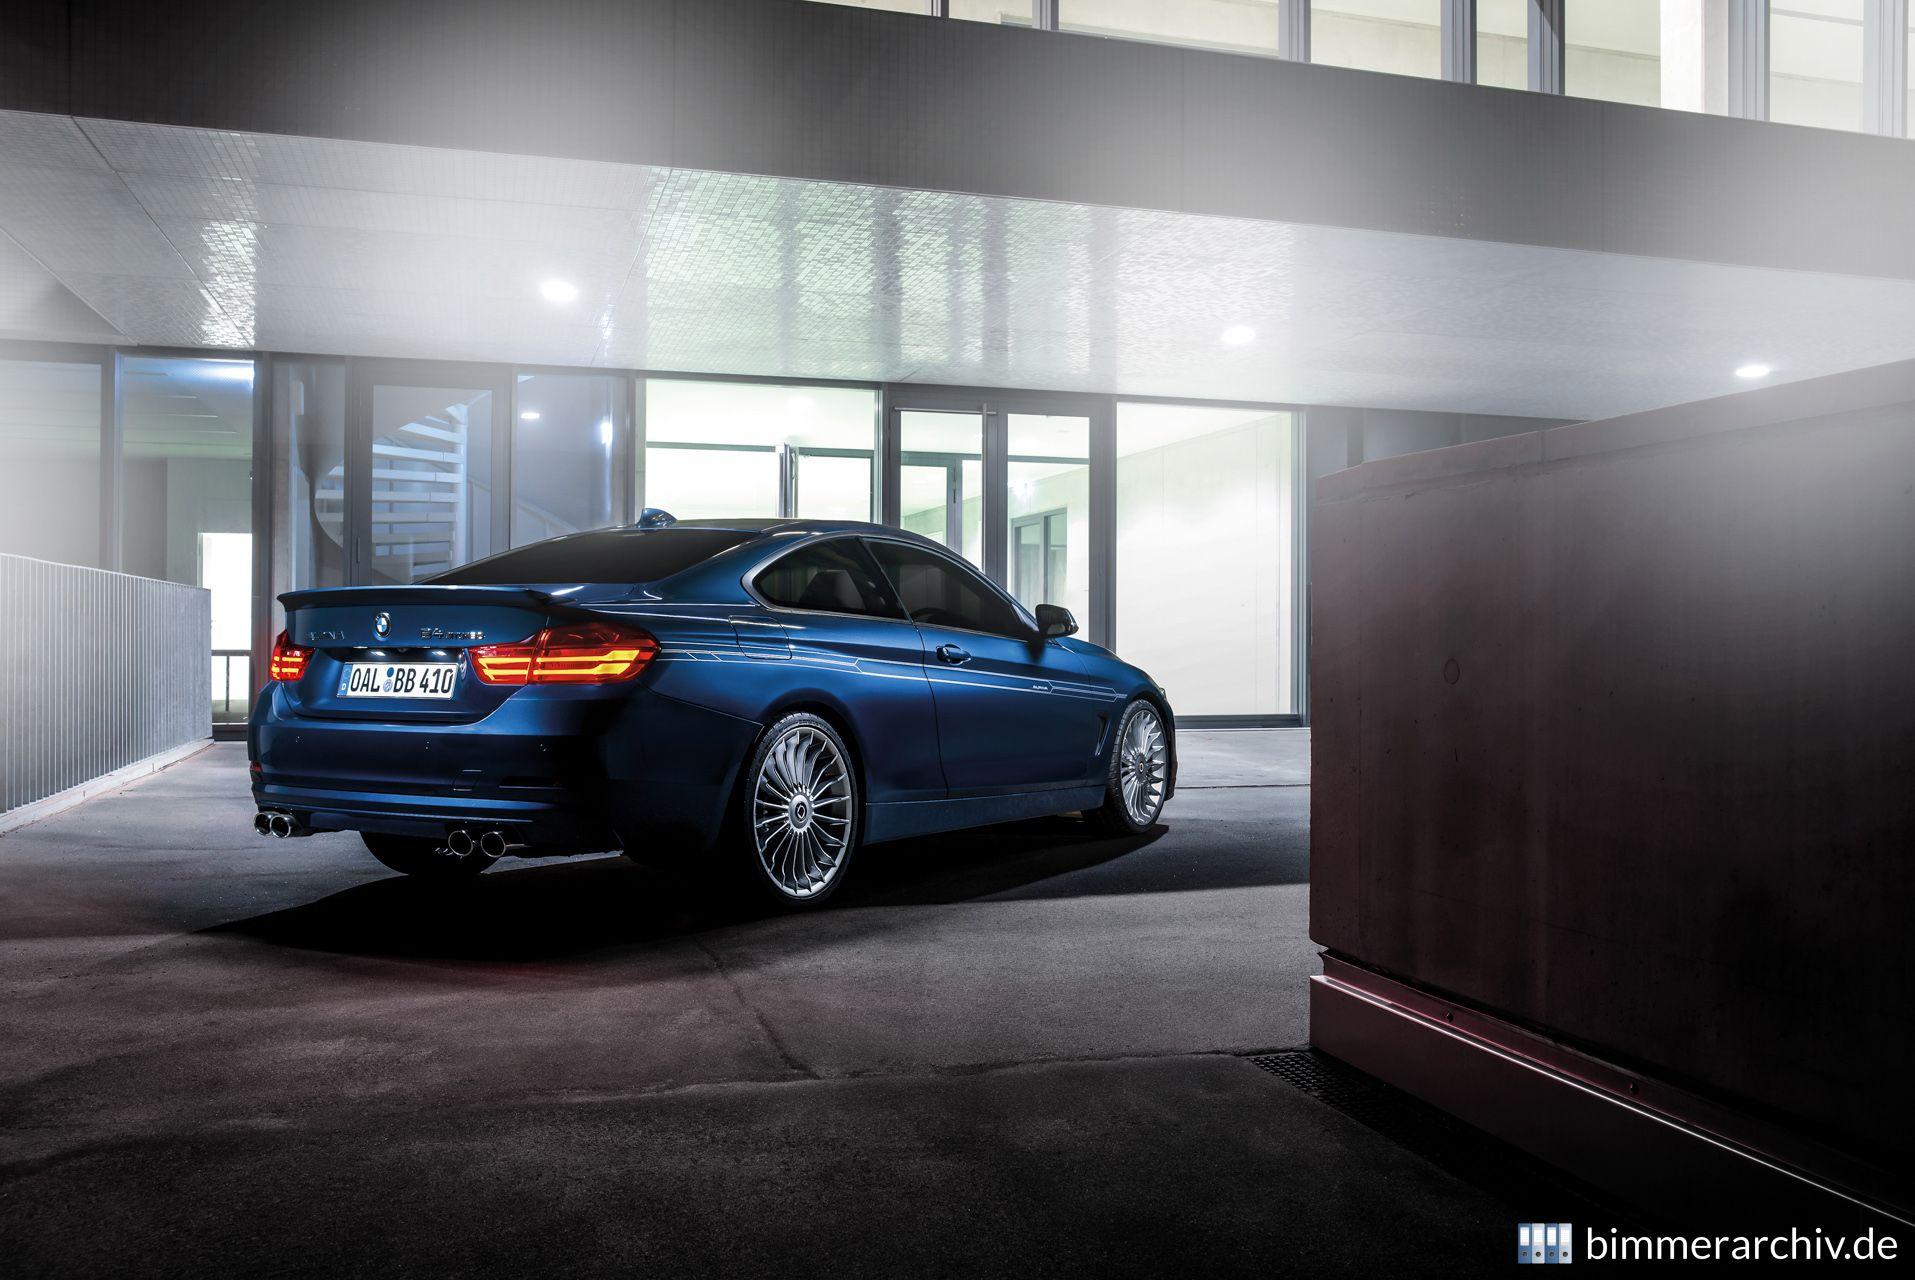 Model Archive for BMW models · BMW Alpina B4 Bi-Turbo · bmwarchive.org